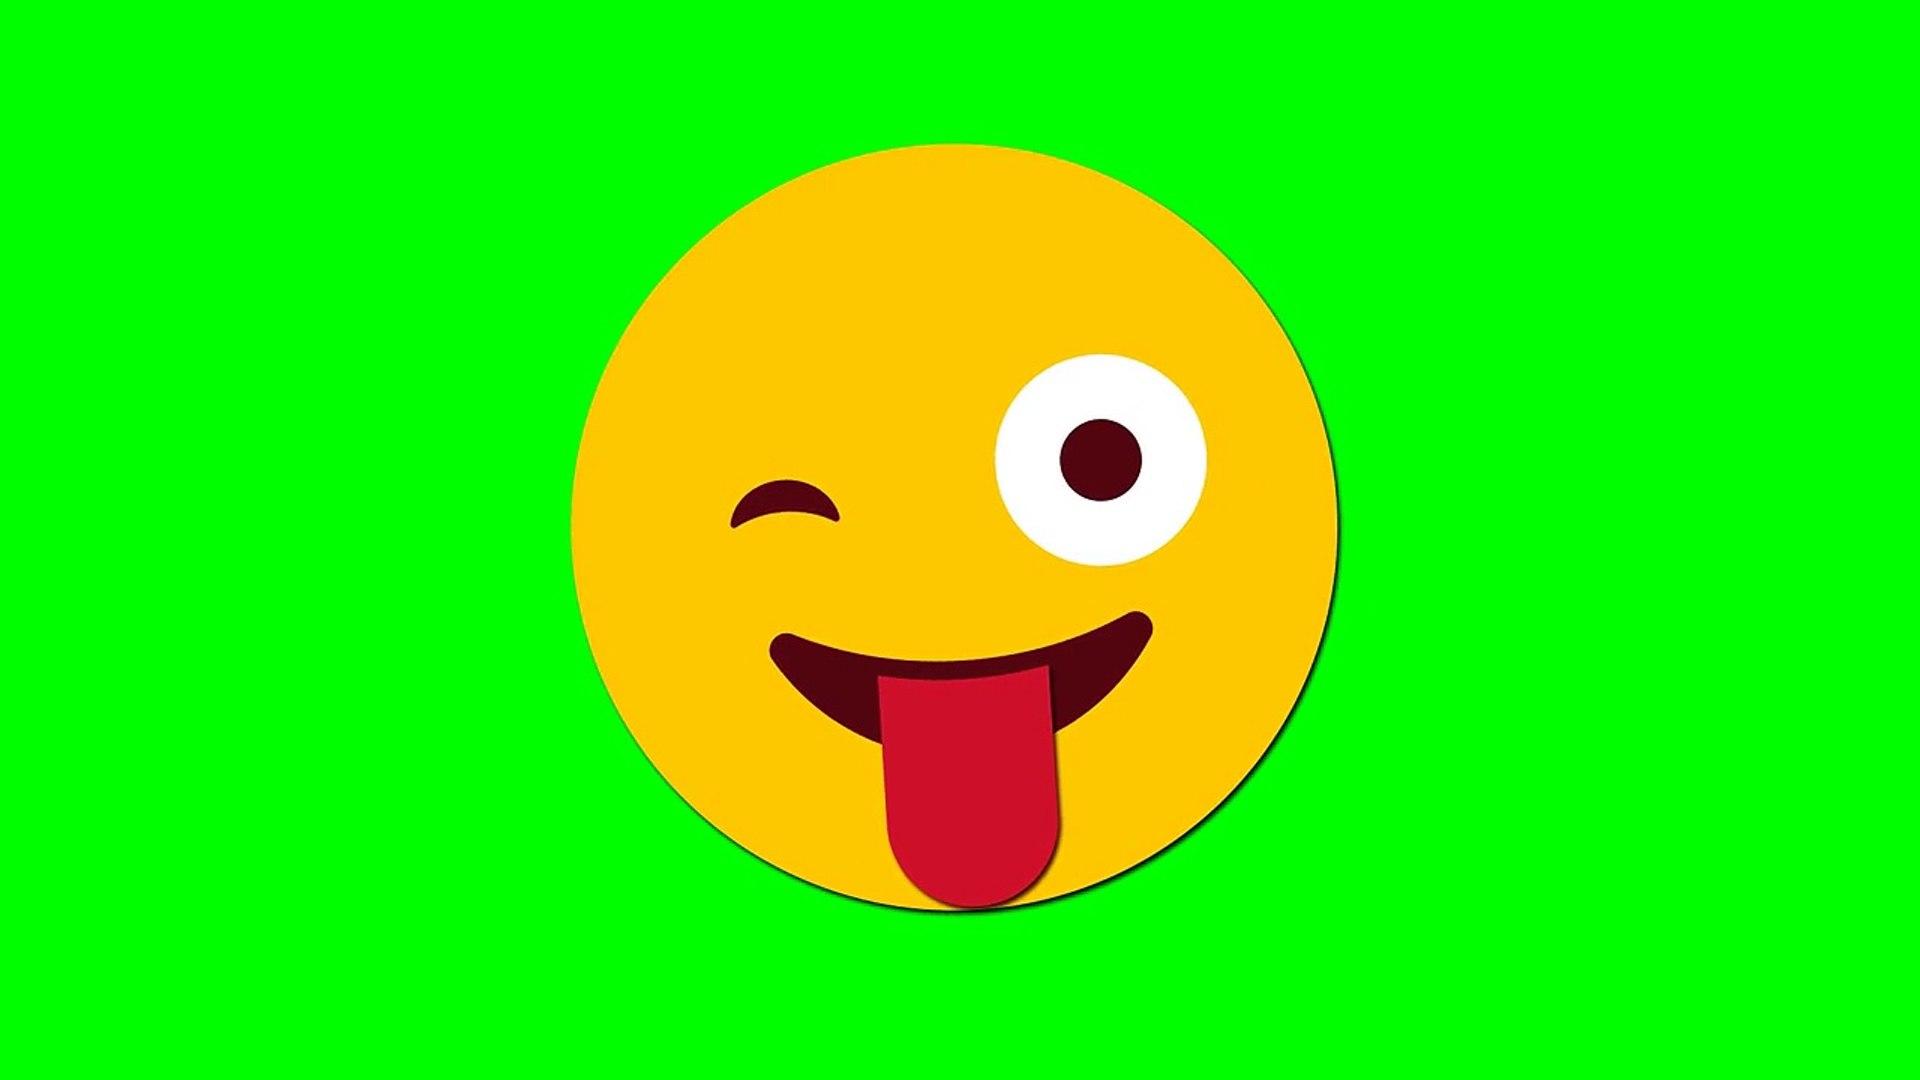 Emoji Stuck Out Tongue Winking Eyes Green Screen Khroma Key animation   эмоджи на зелёном фоне